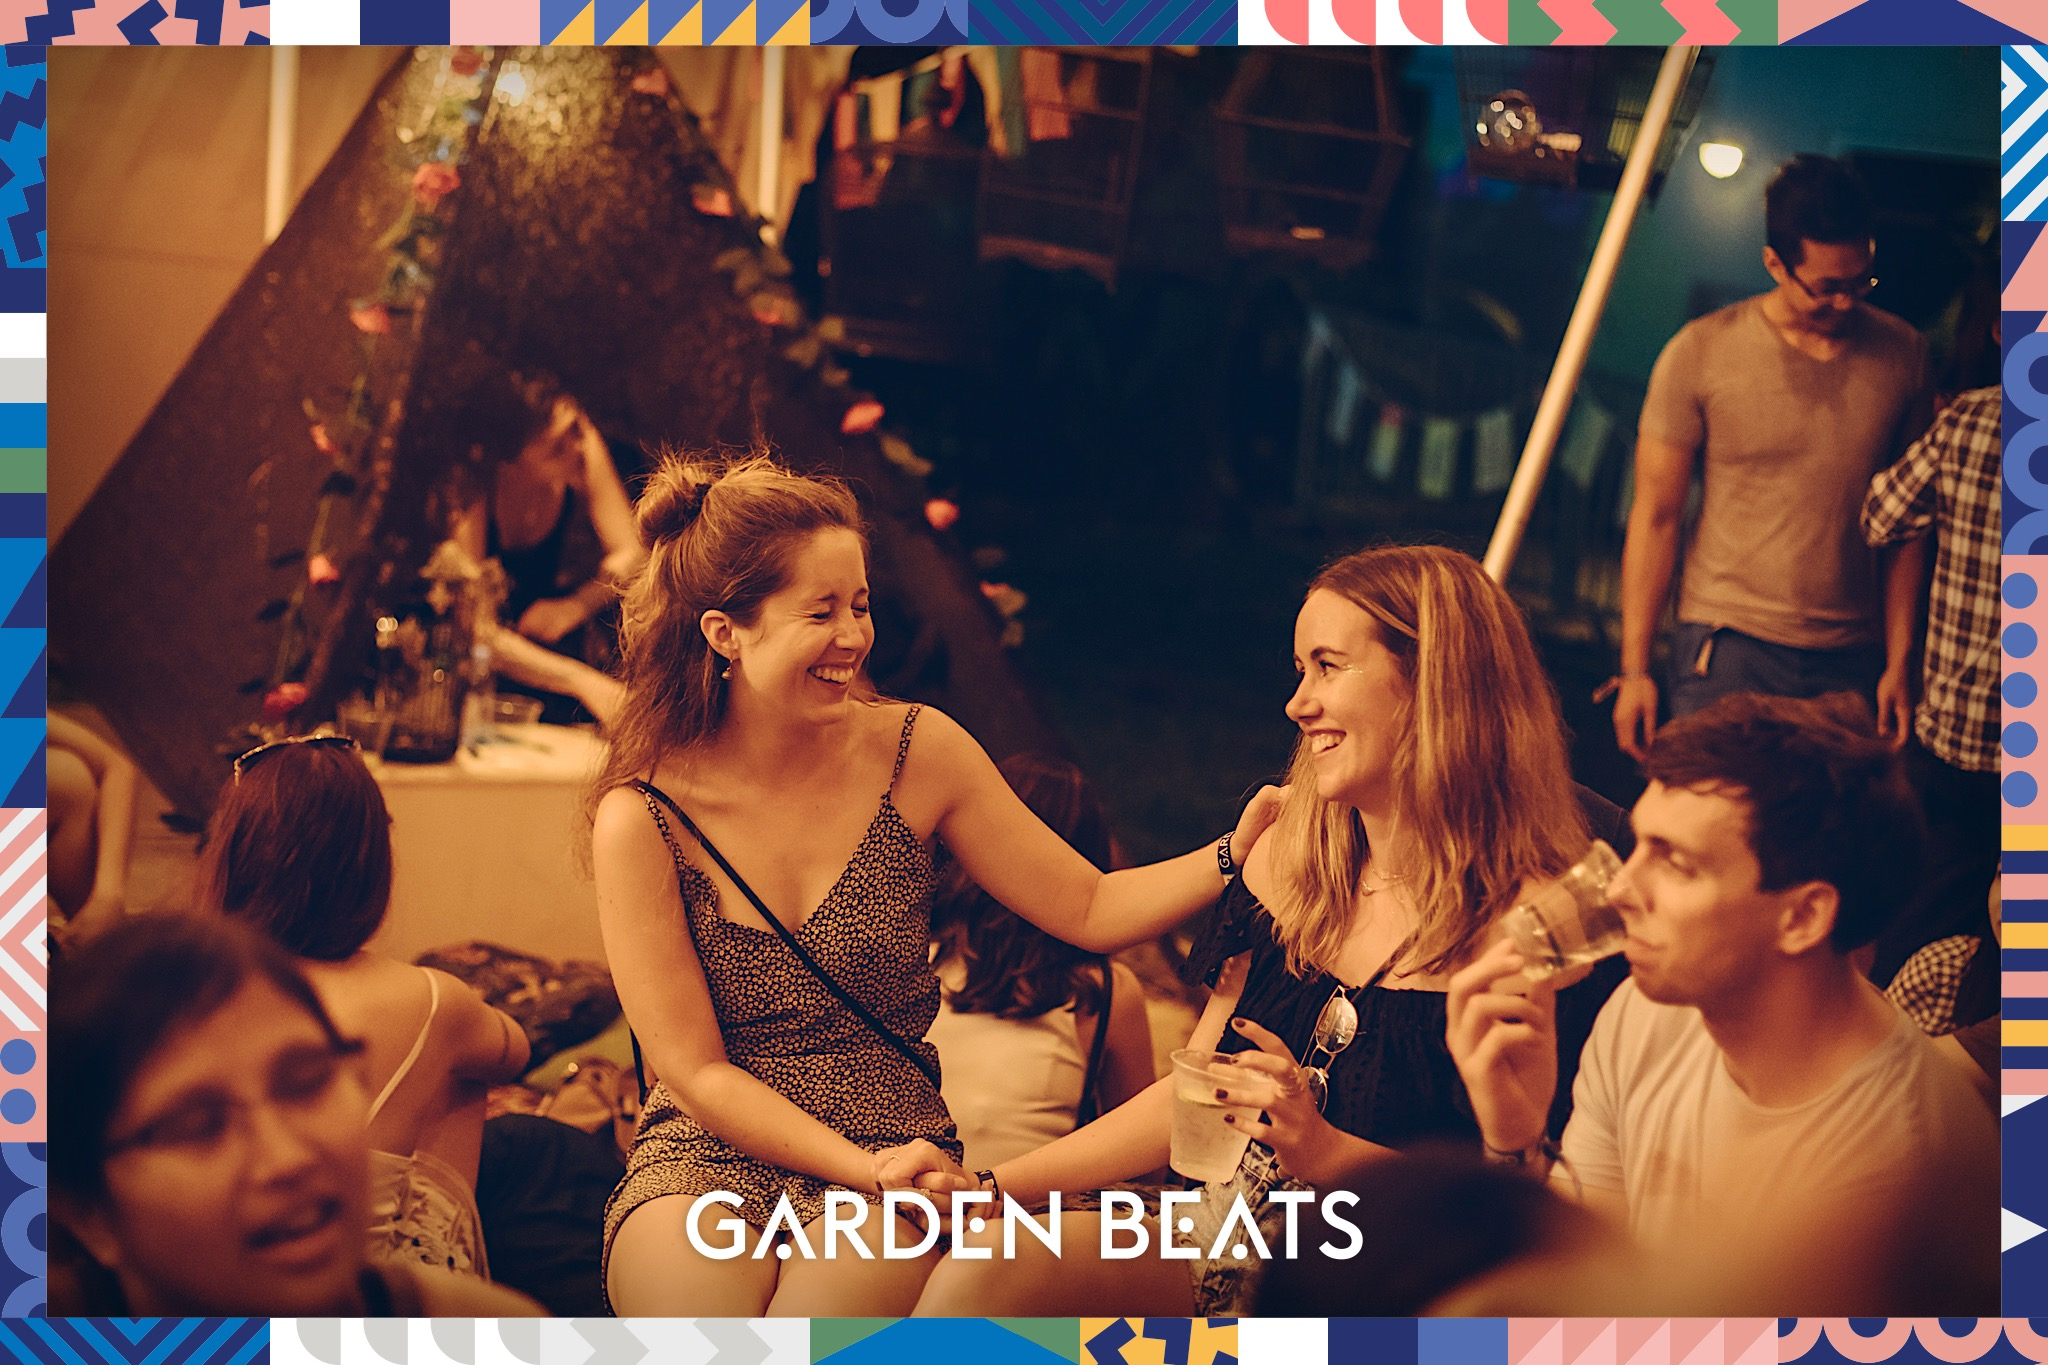 03032018_GardenBeats_Colossal915_Watermarked.jpg